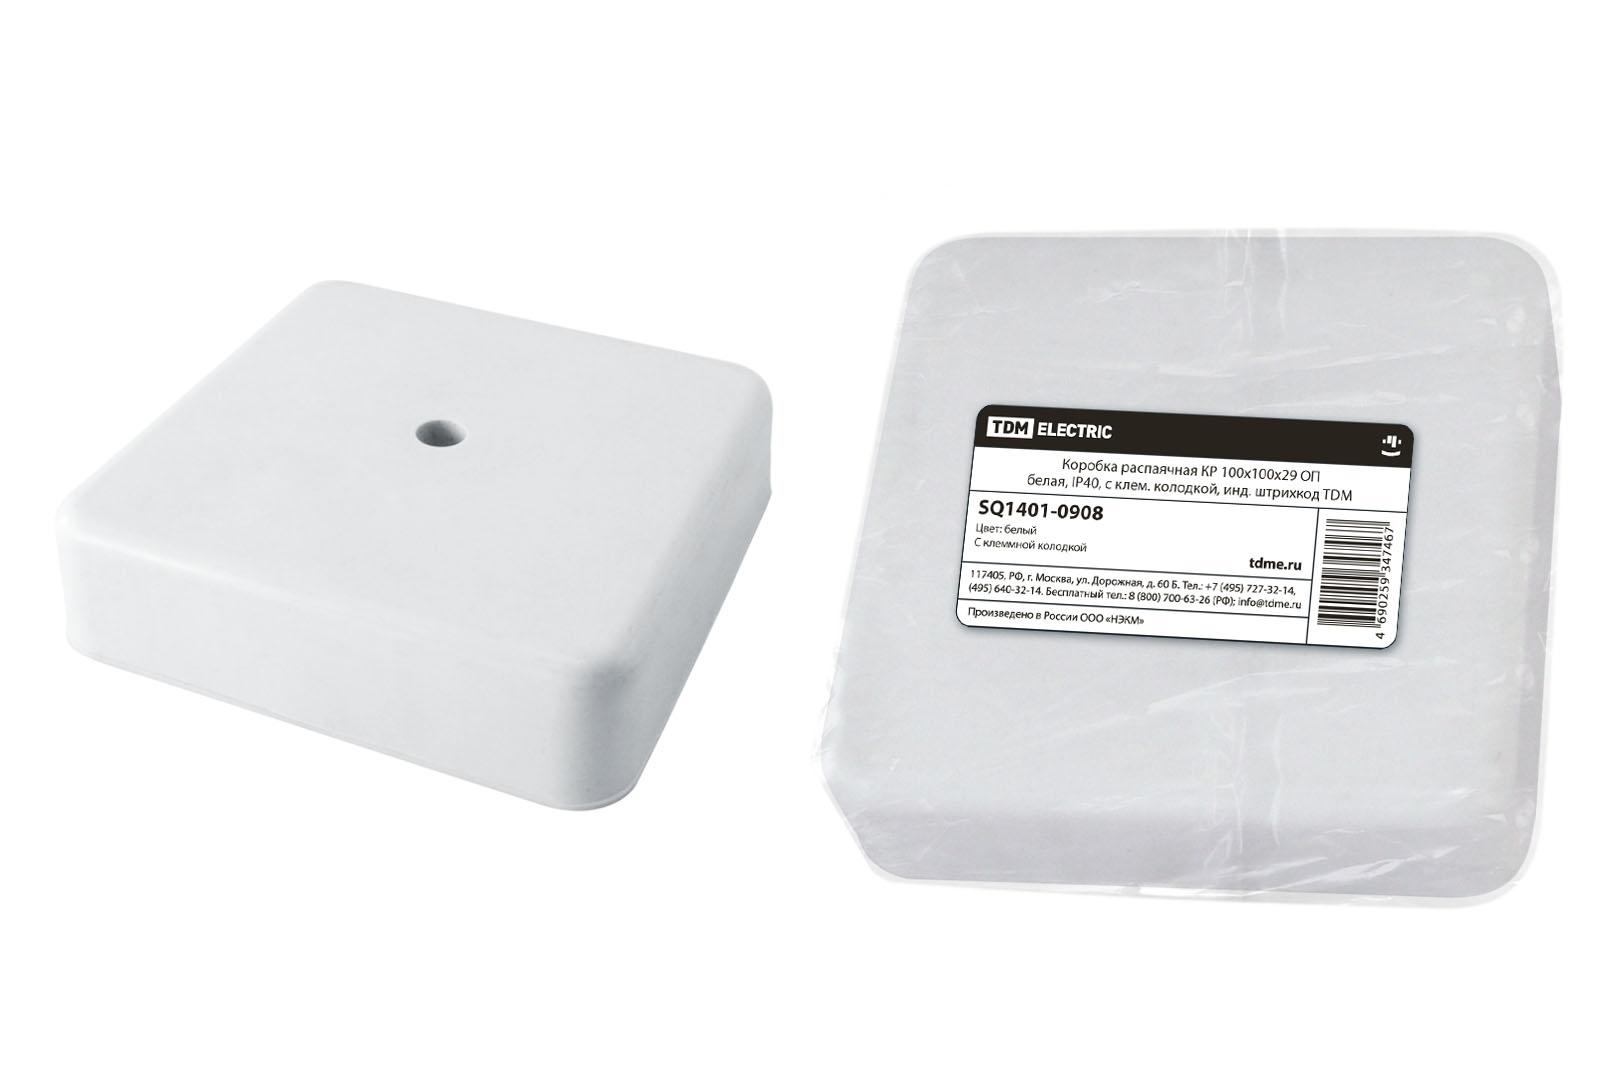 Фото Коробка распаячная КР 100х100х29 ОП белая, IP40, с клем. колодкой, инд. штрихкод TDM {SQ1401-0908}